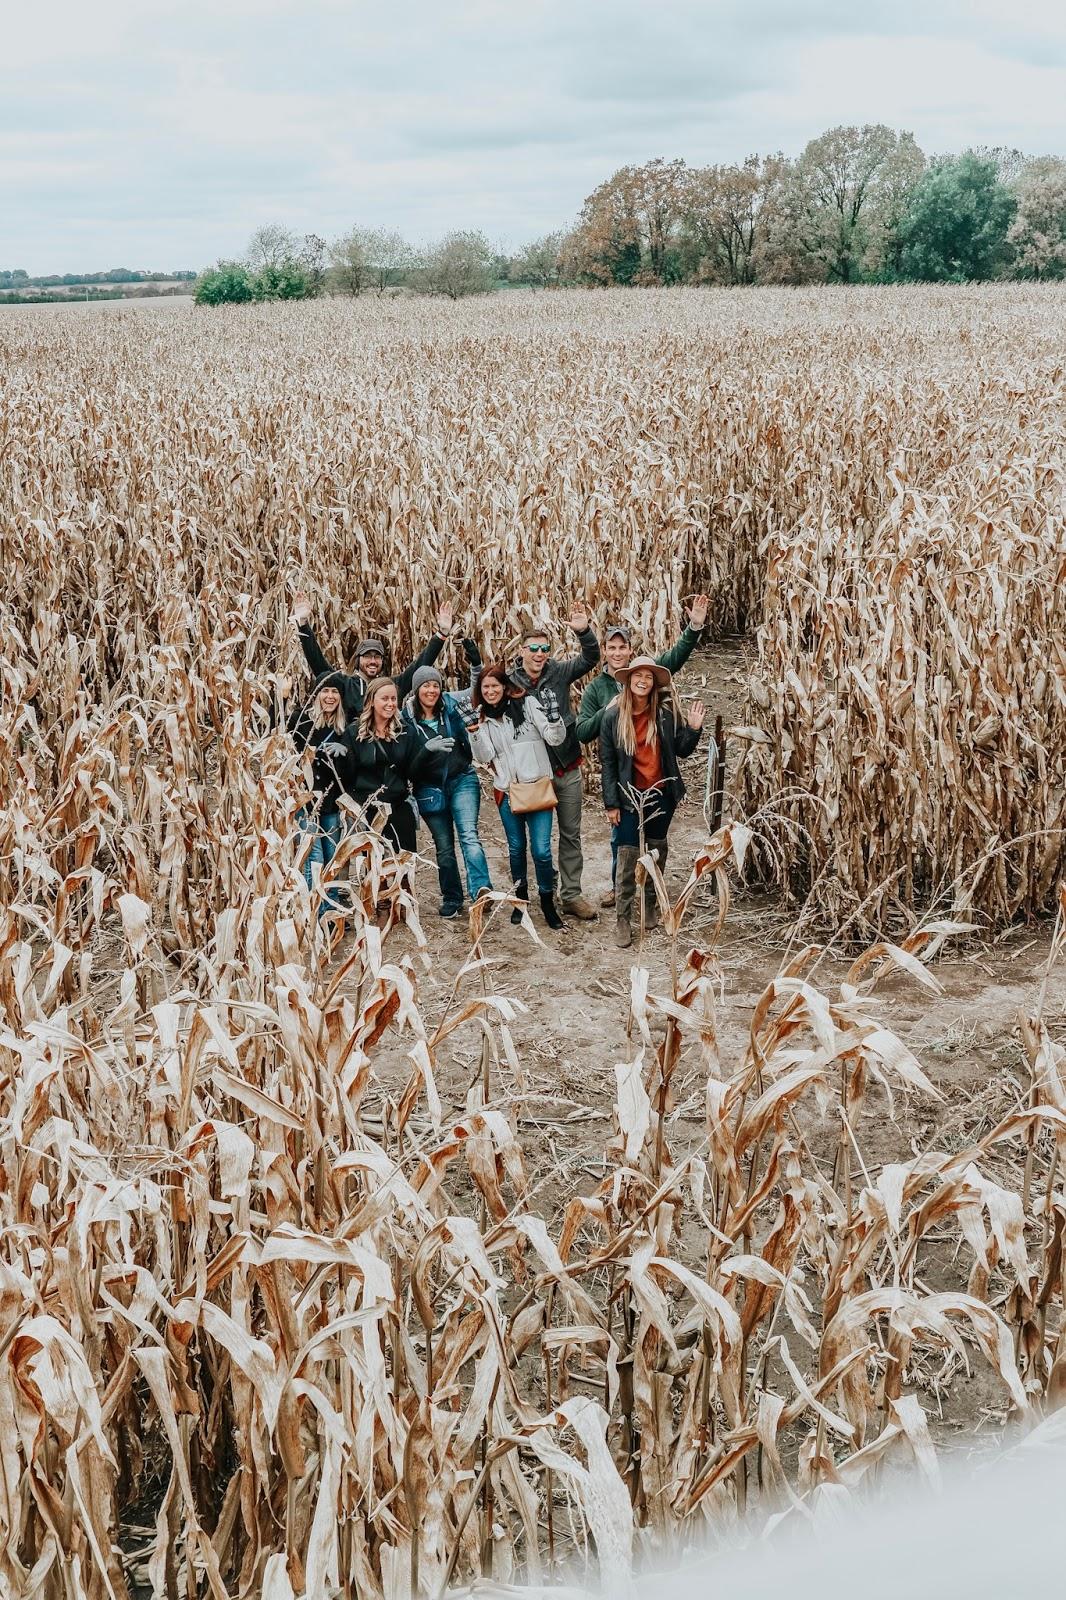 Friends in the cornfield at Schuster's Farm in Deerfield, Wisconsin